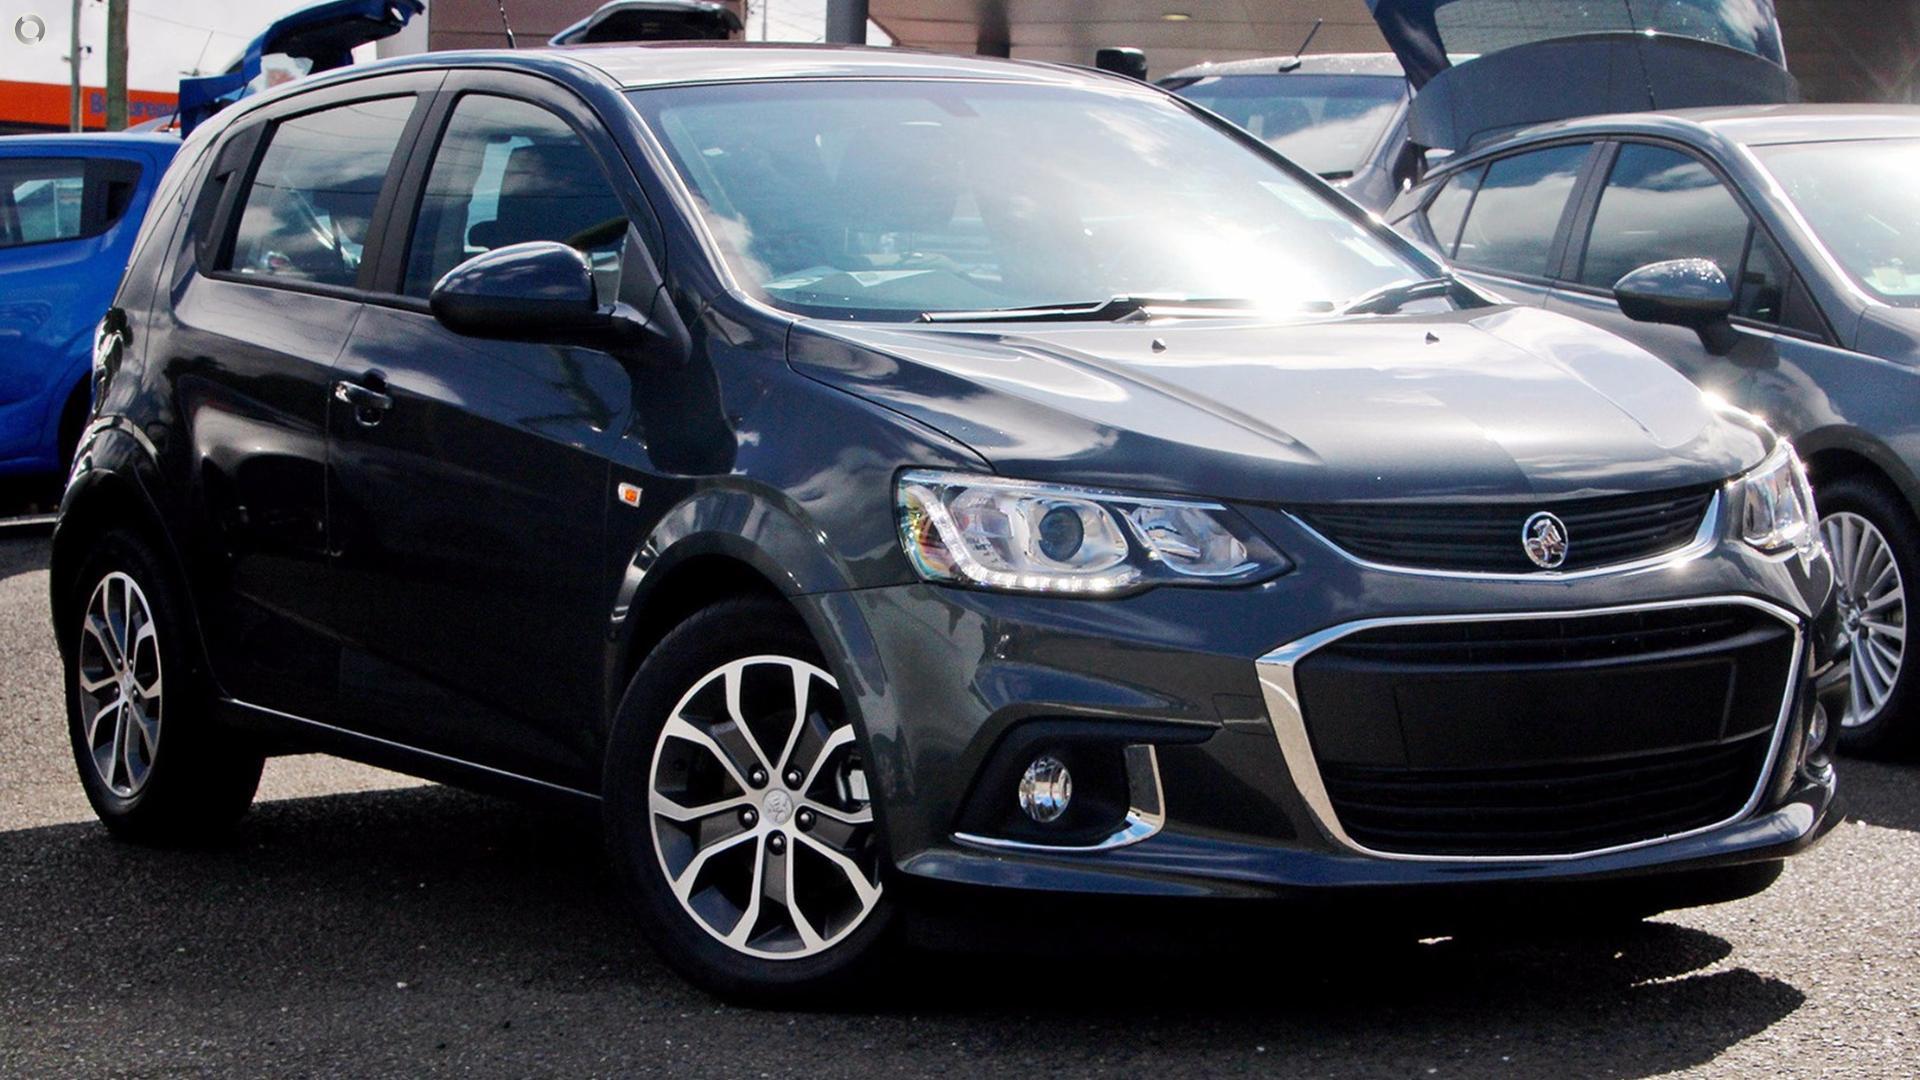 2017 Holden Barina Ls